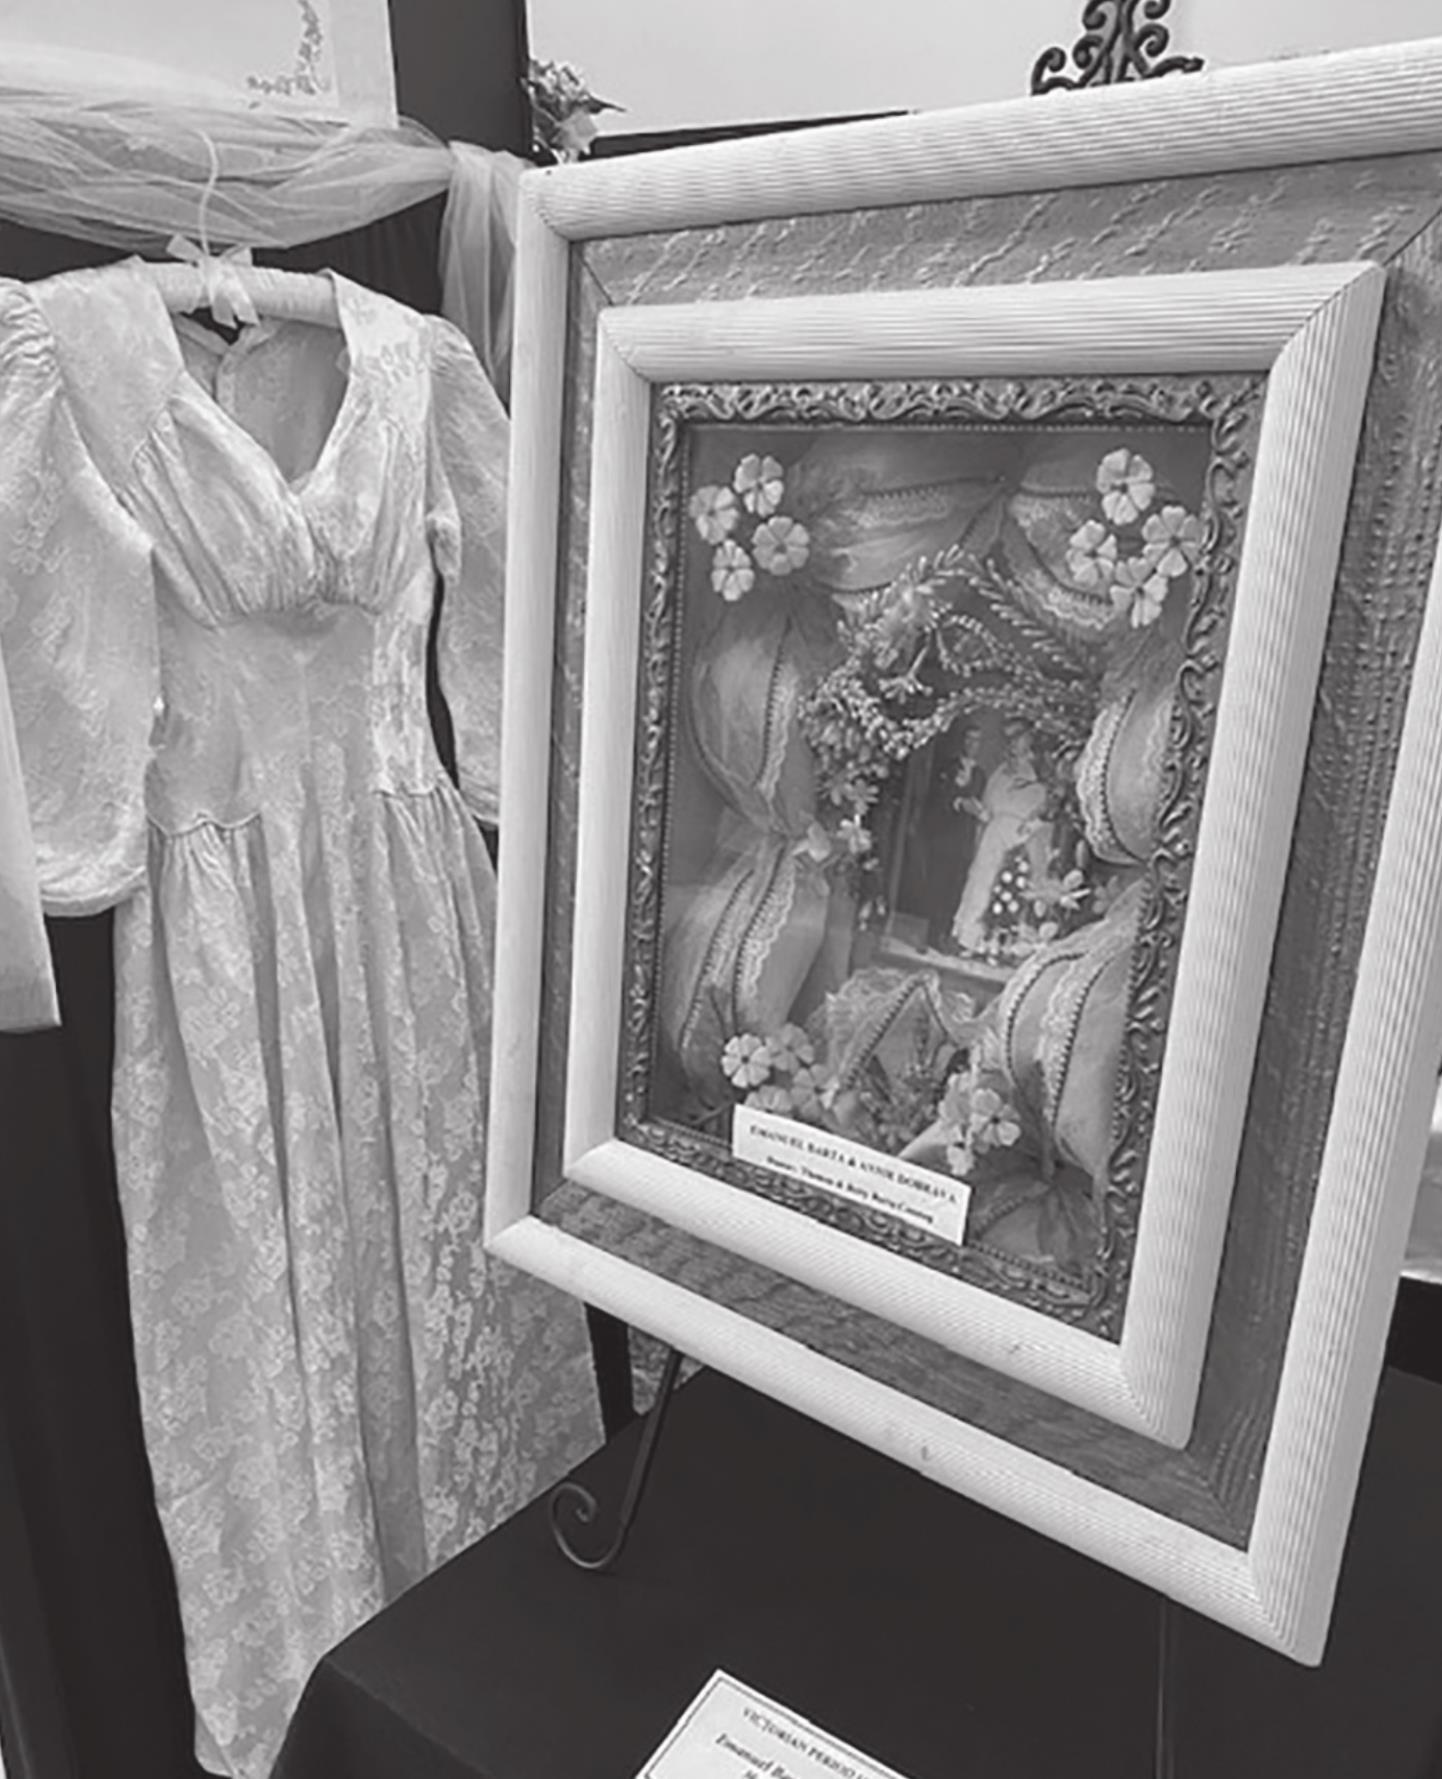 TCHCC Museum Opens New Exhibit on Czech Weddings